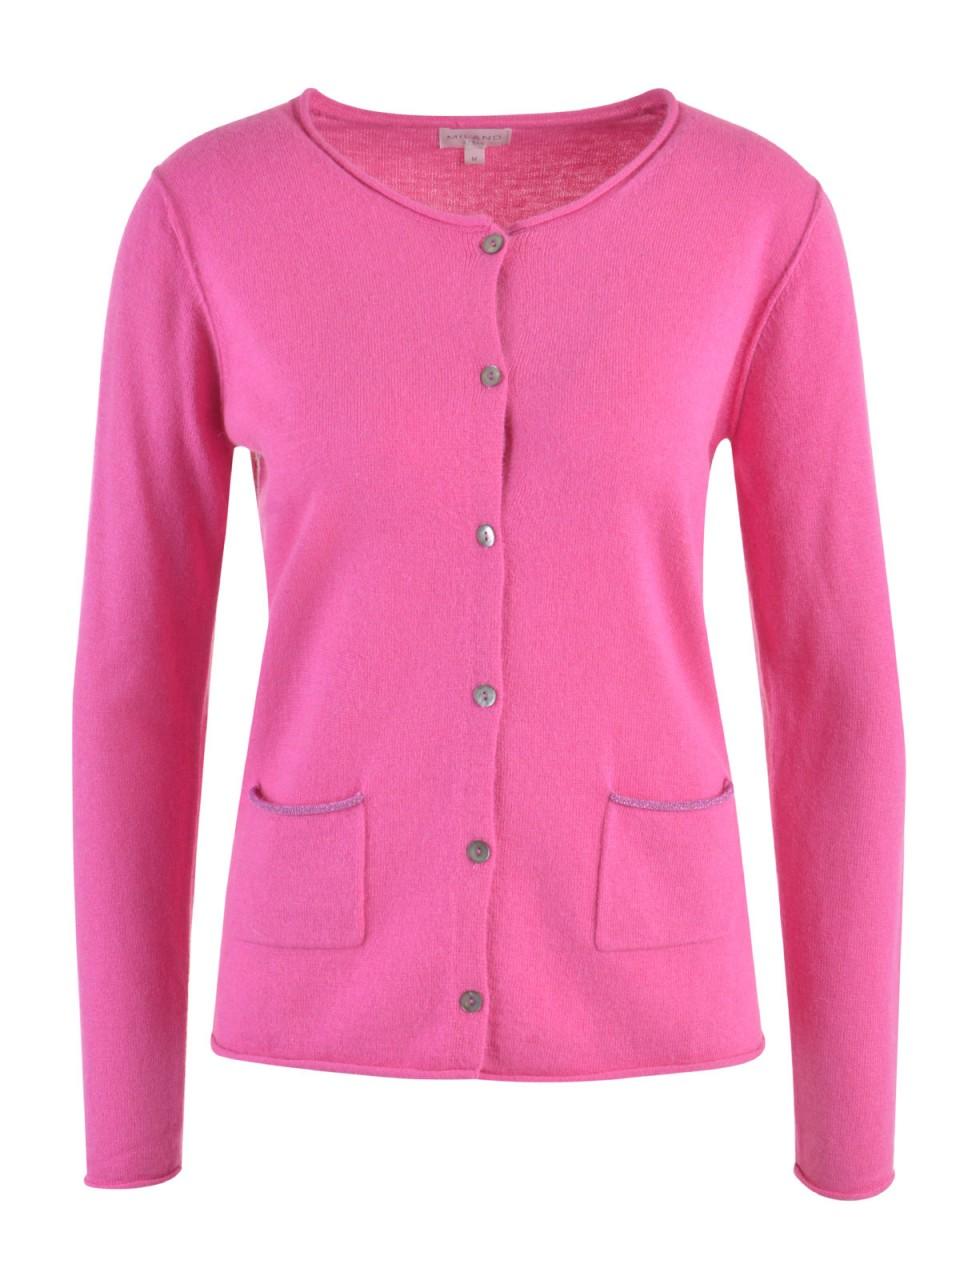 Jacken - MILANO ITALY Damen Strickjacke, pink  - Onlineshop Designermode.com